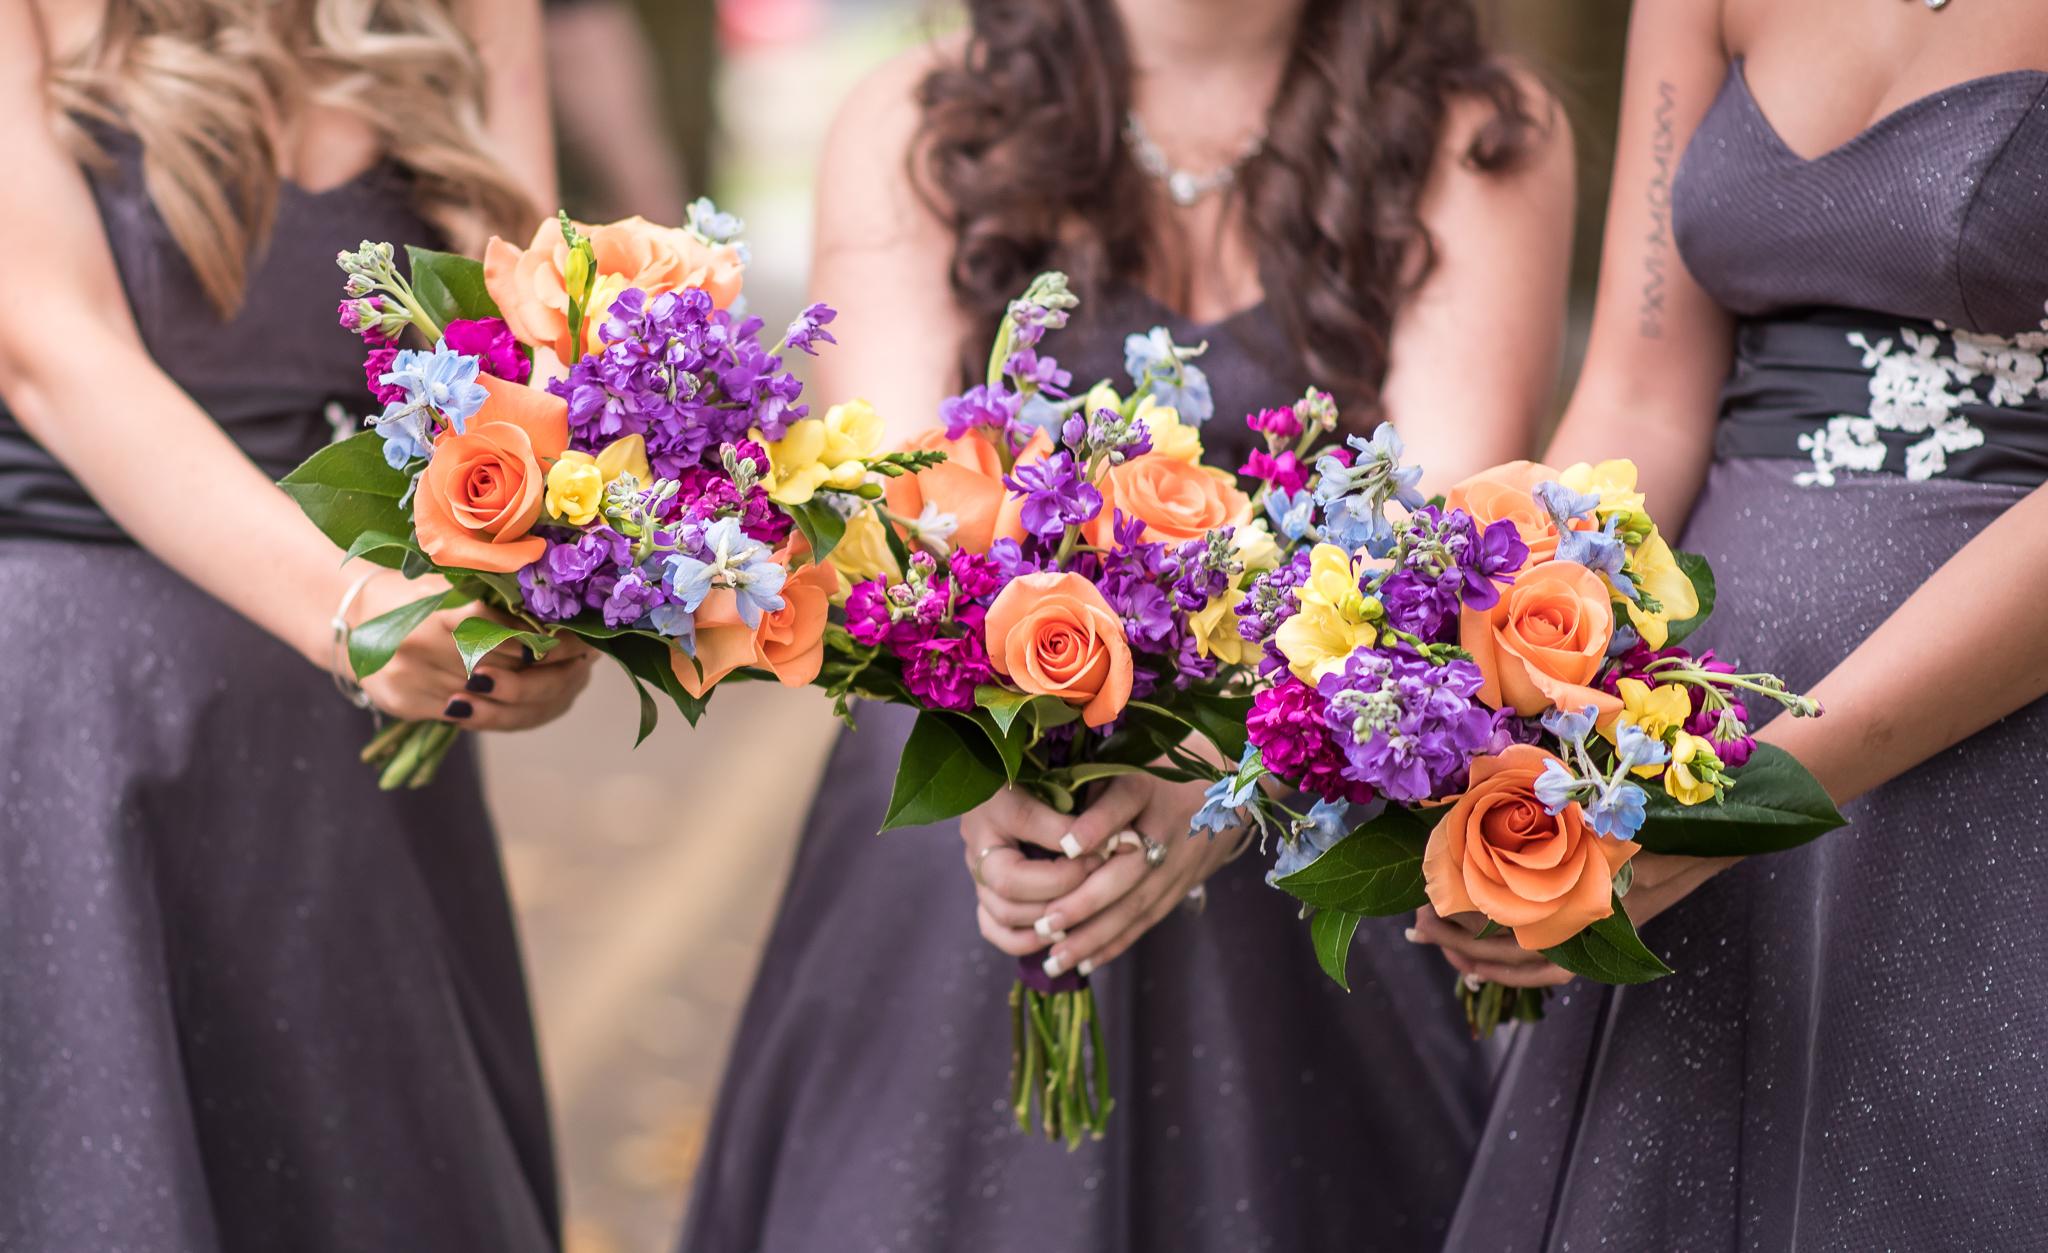 Leah Loves That Photography Flowers and Purple Dresses bridesmaidsconfession.com